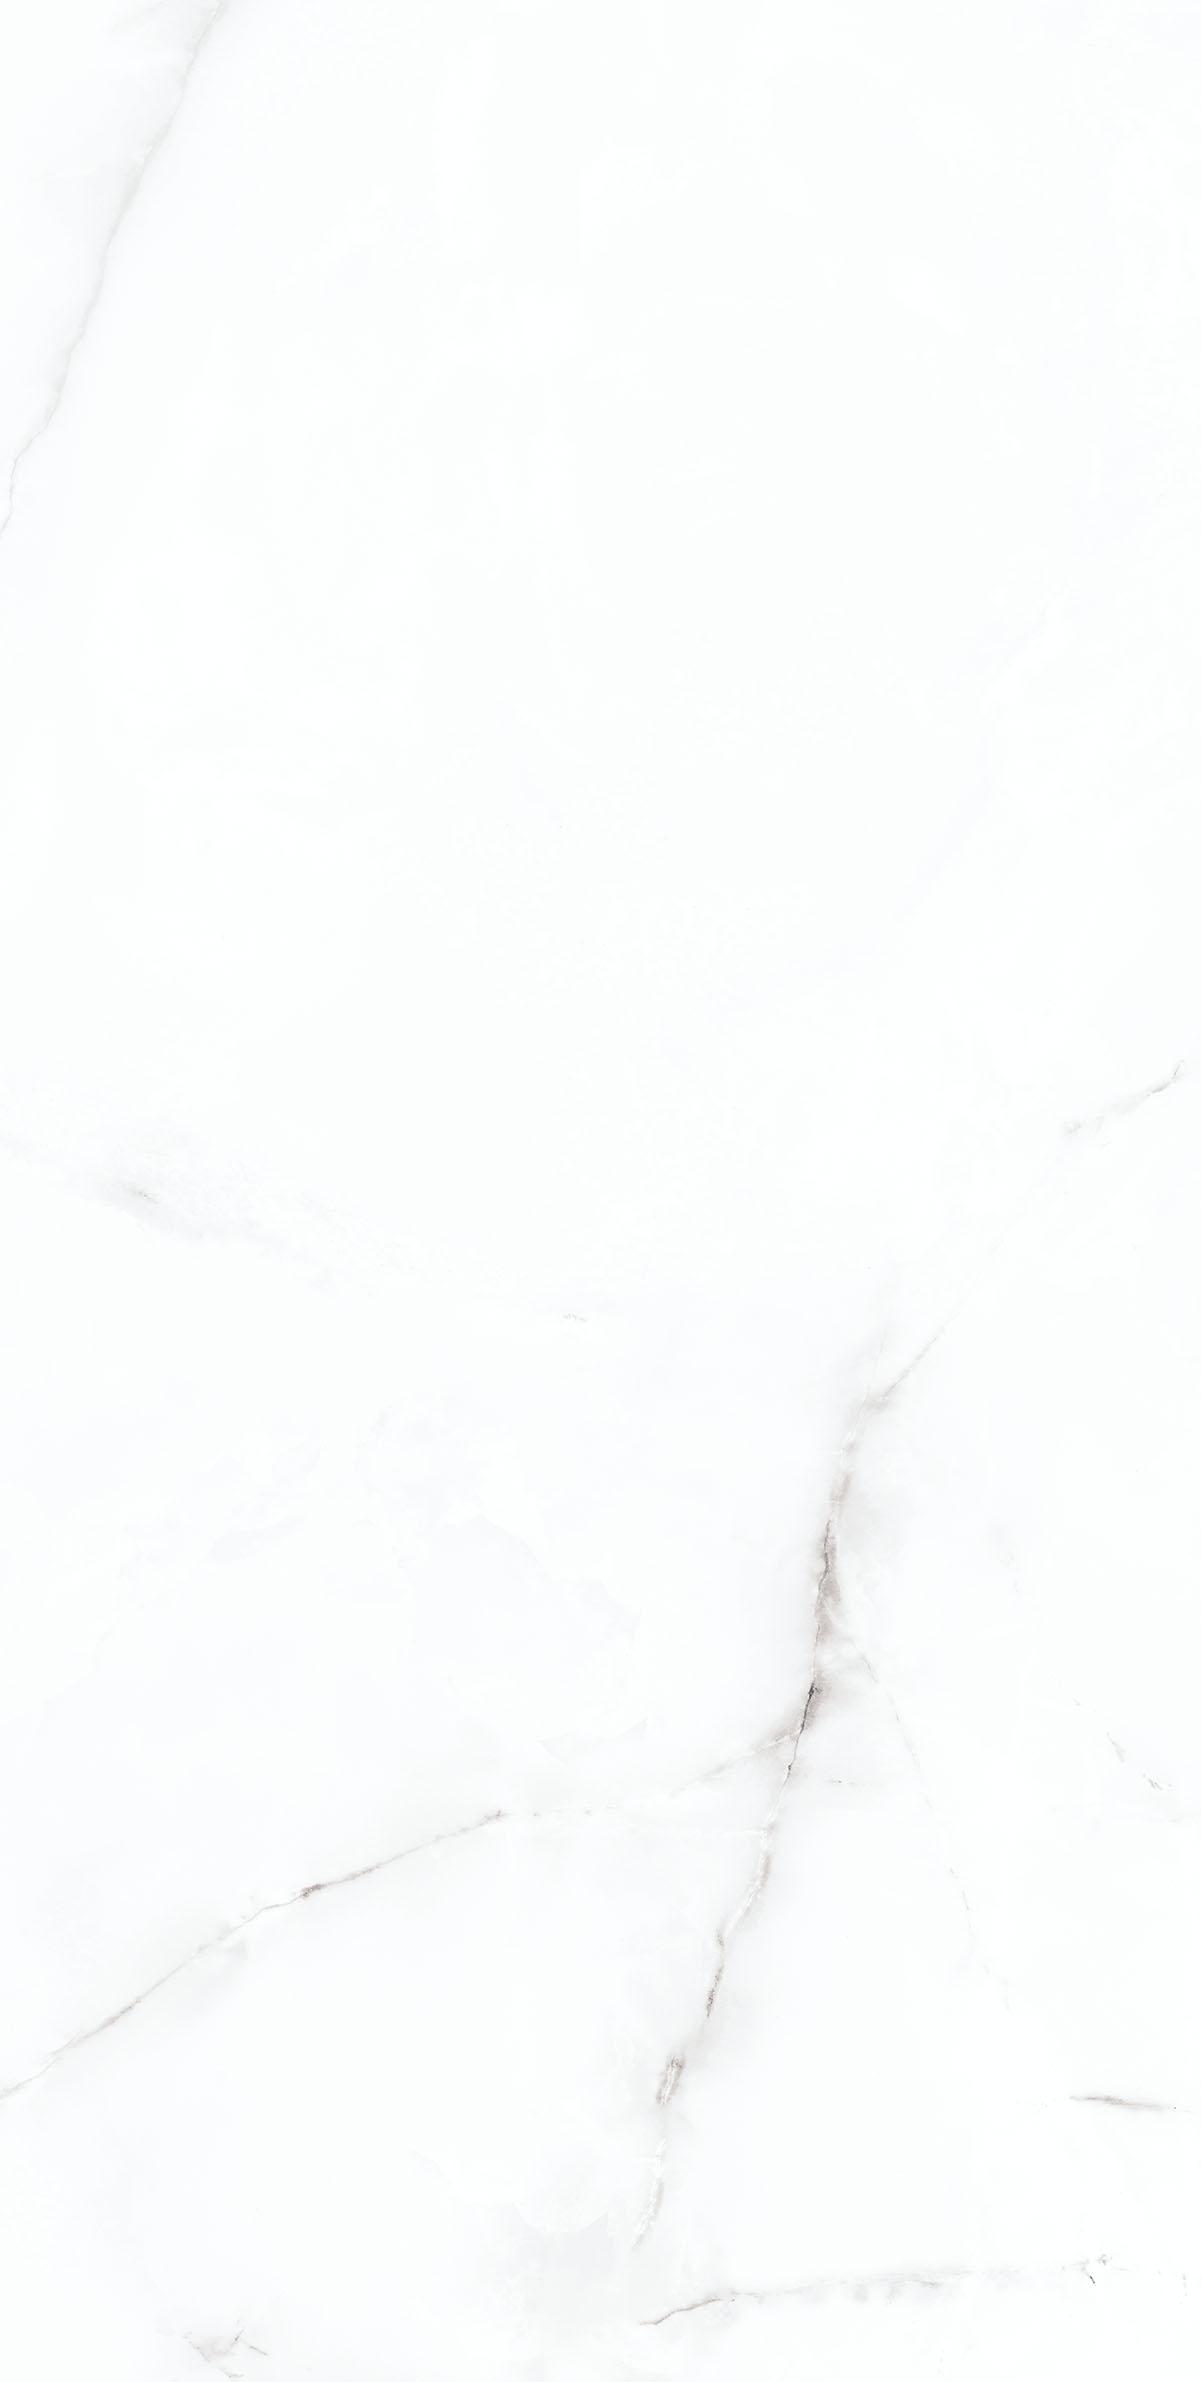 Angora grey 273602 30x60x0,85 - Hansas Plaadimaailm